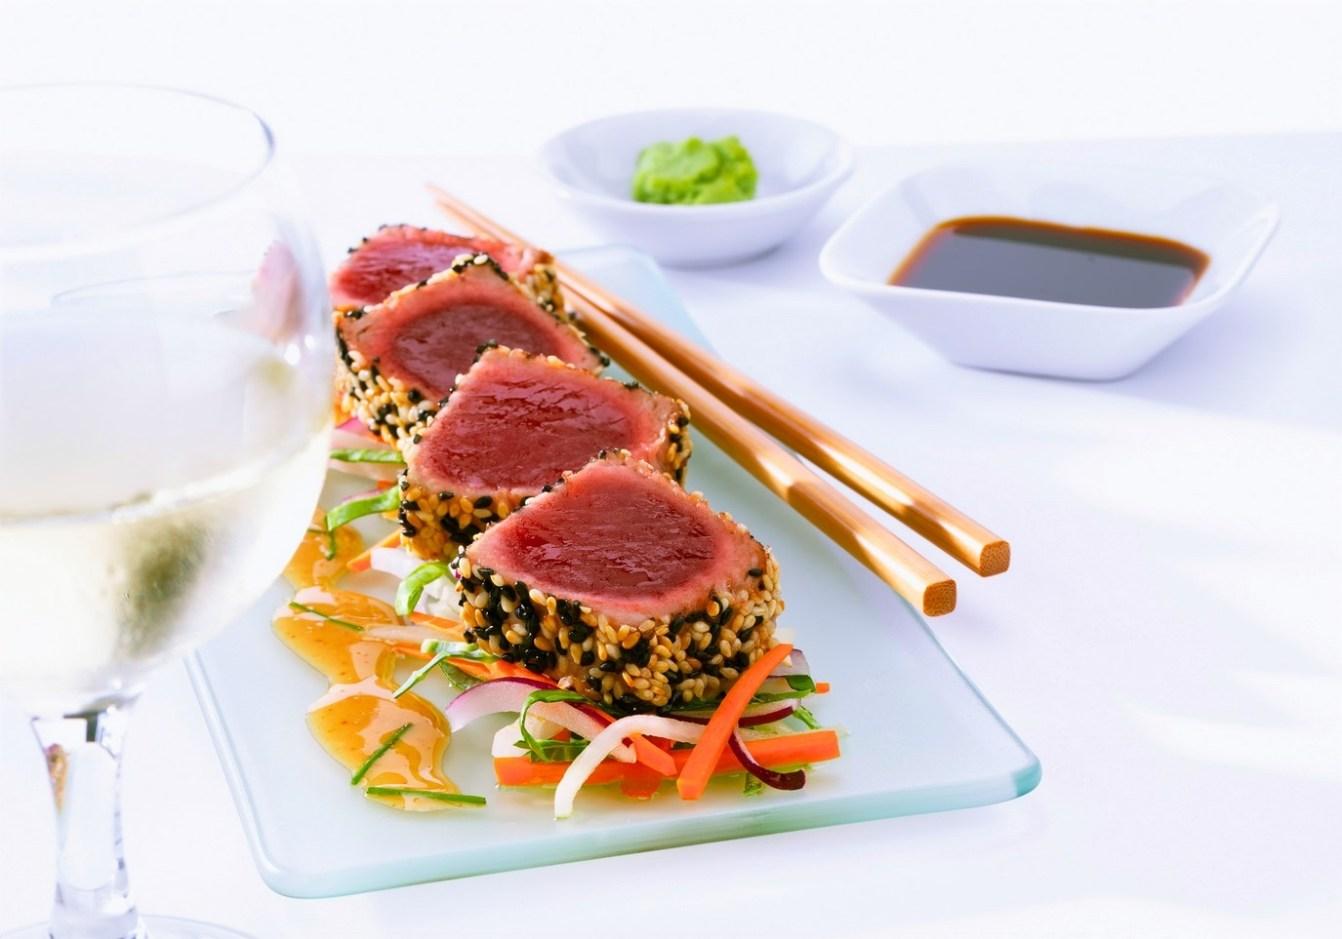 116 JAPANESE FUSION FOOD PHOTO AWARDS 008601 (Custom)